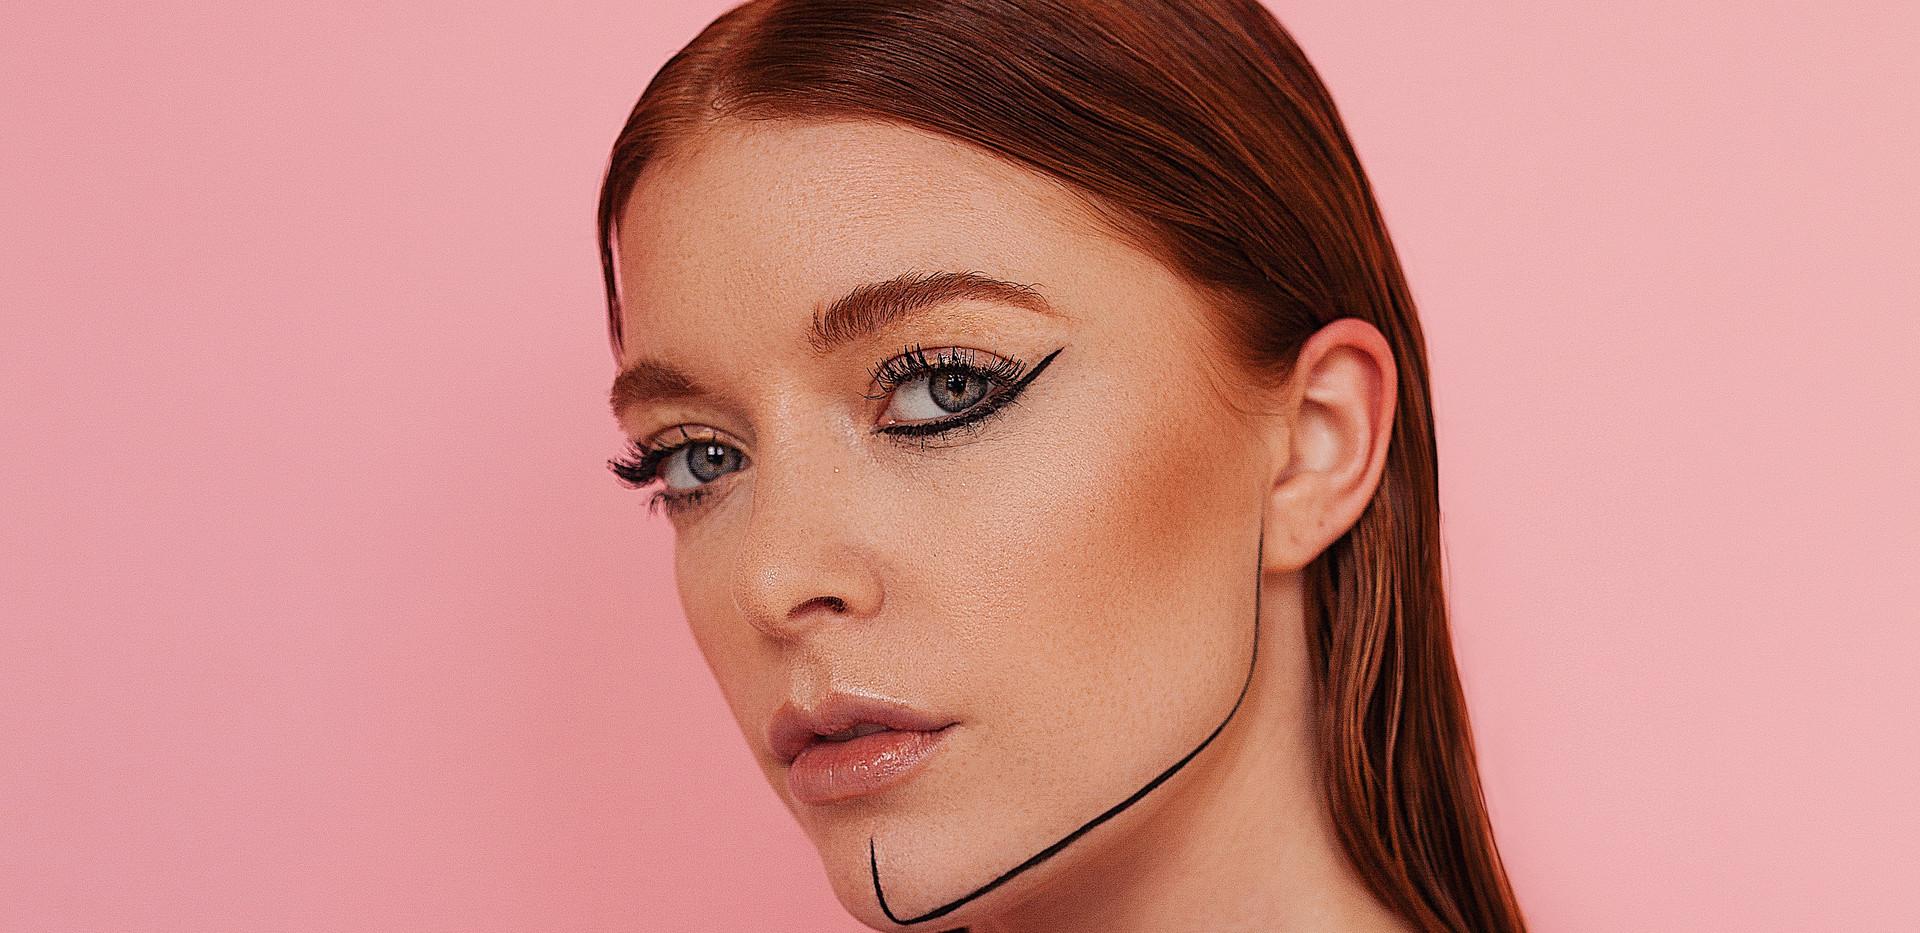 Hairstylist: Kaydee Traghella  Photographer: Peoneemoull Pech  Model: Kristina Dirksen  Makeup Artist: Bianca Corso